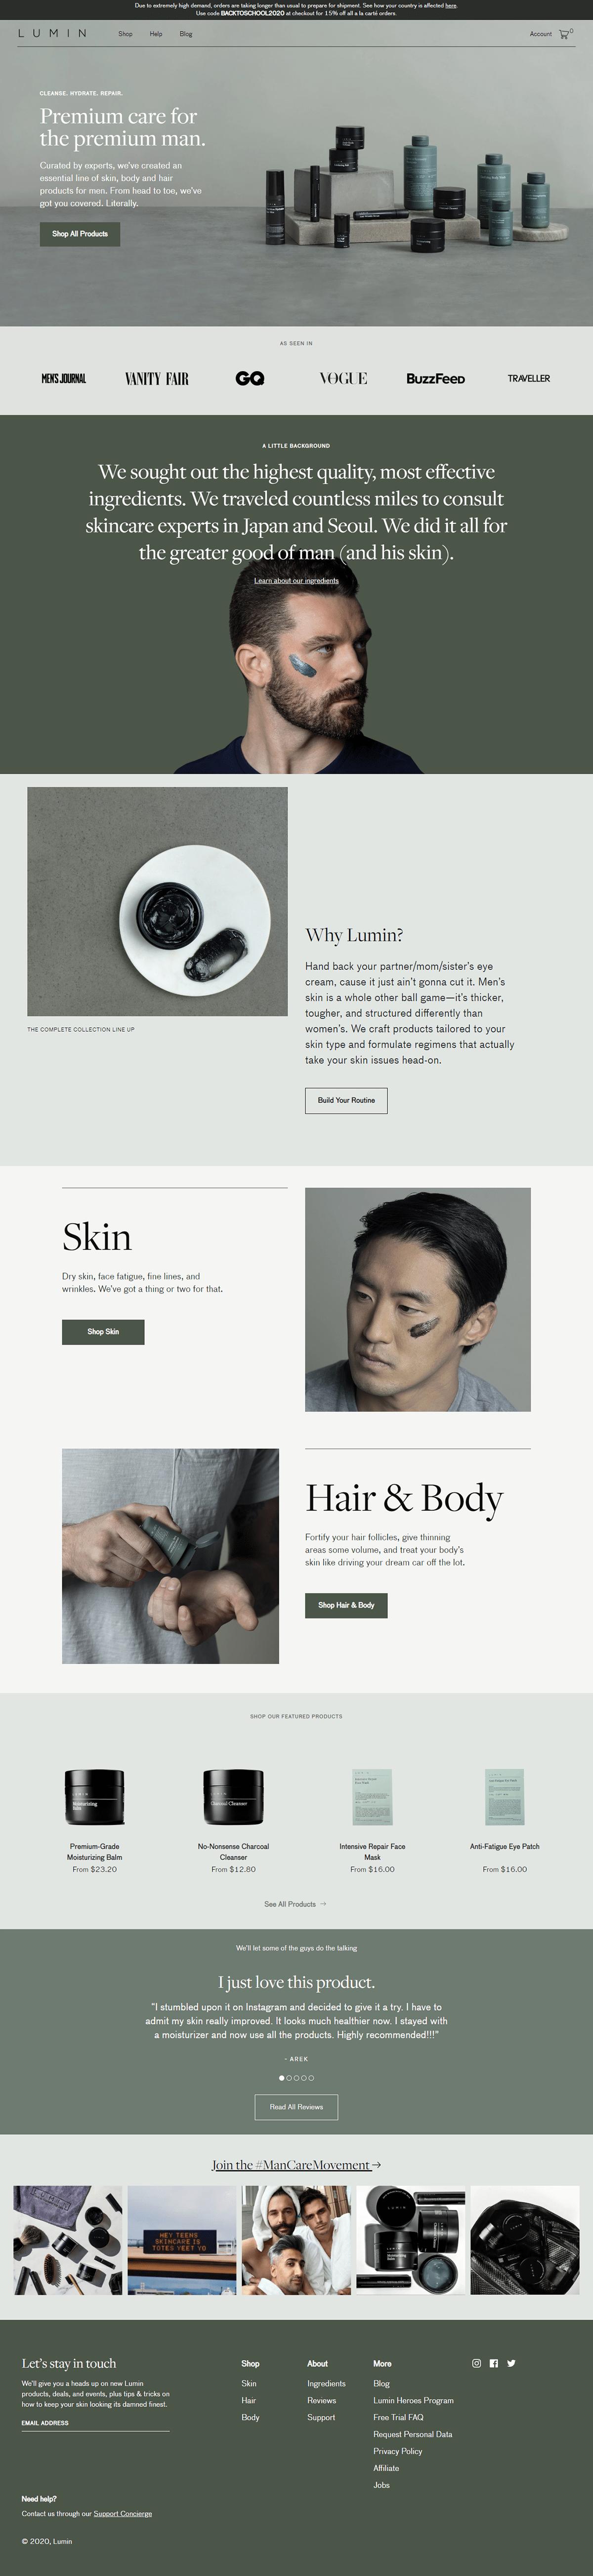 Image may contain: human face, screenshot and person